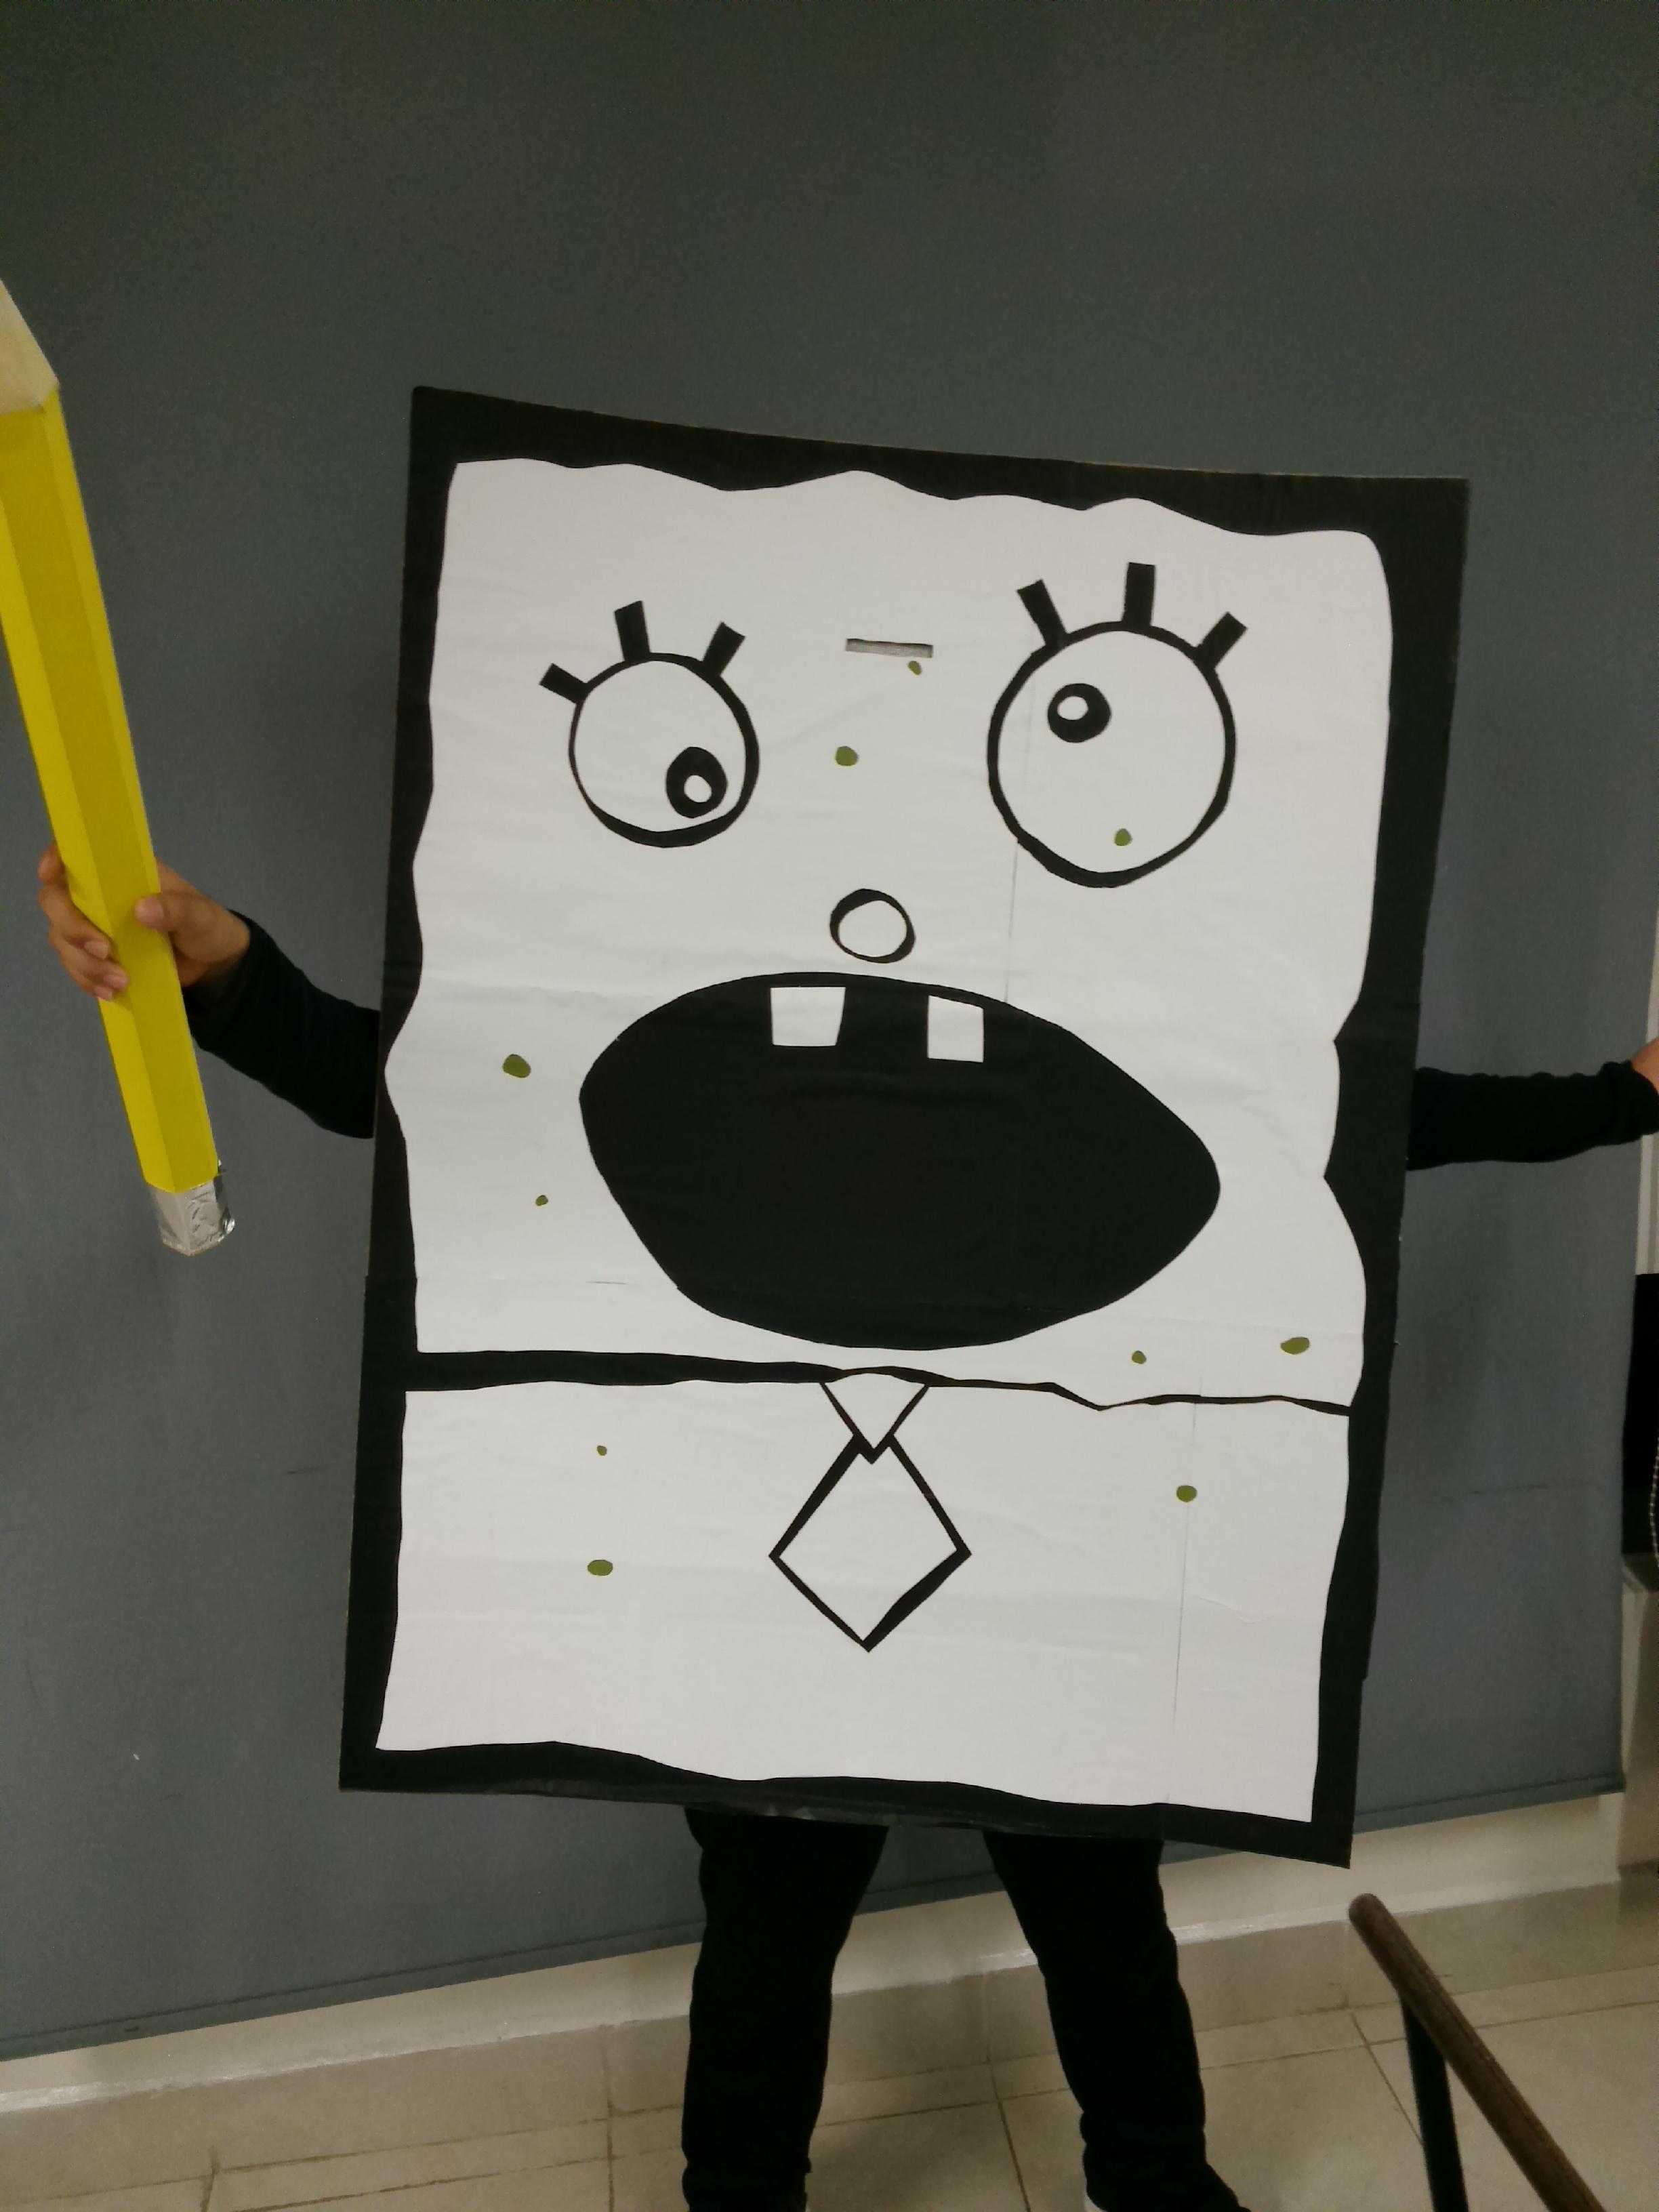 My doodlebob costume for Halloween